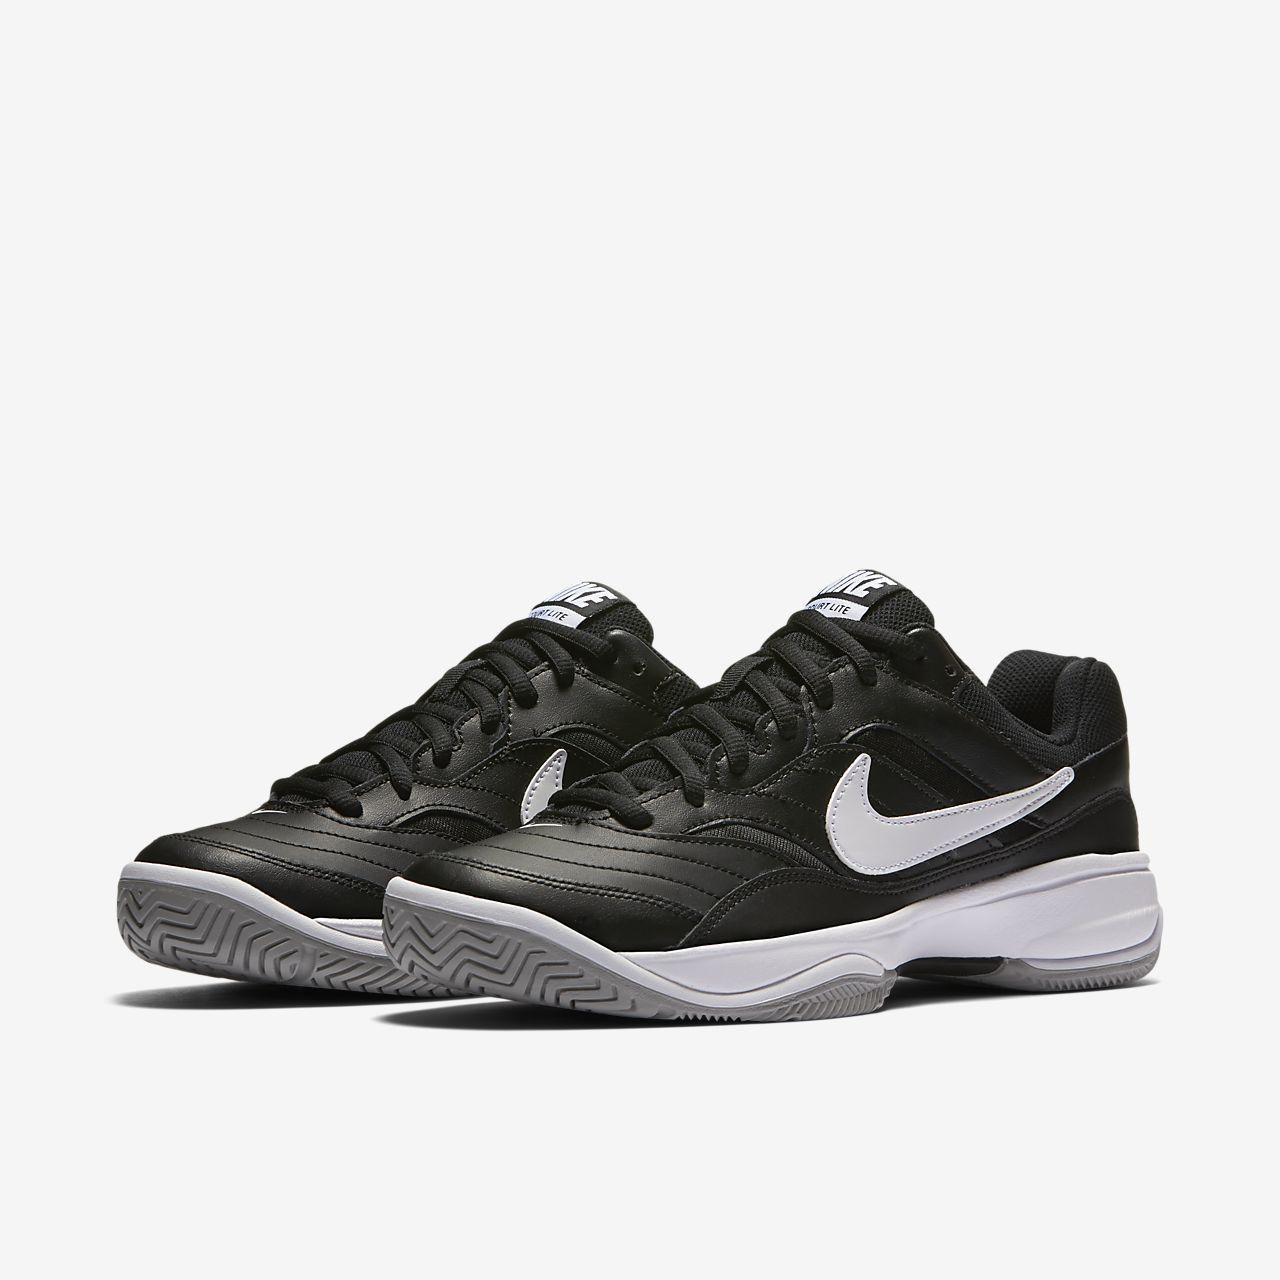 69eb6c9d707d NikeCourt Lite Men s Hard Court Tennis Shoe. Nike.com IN